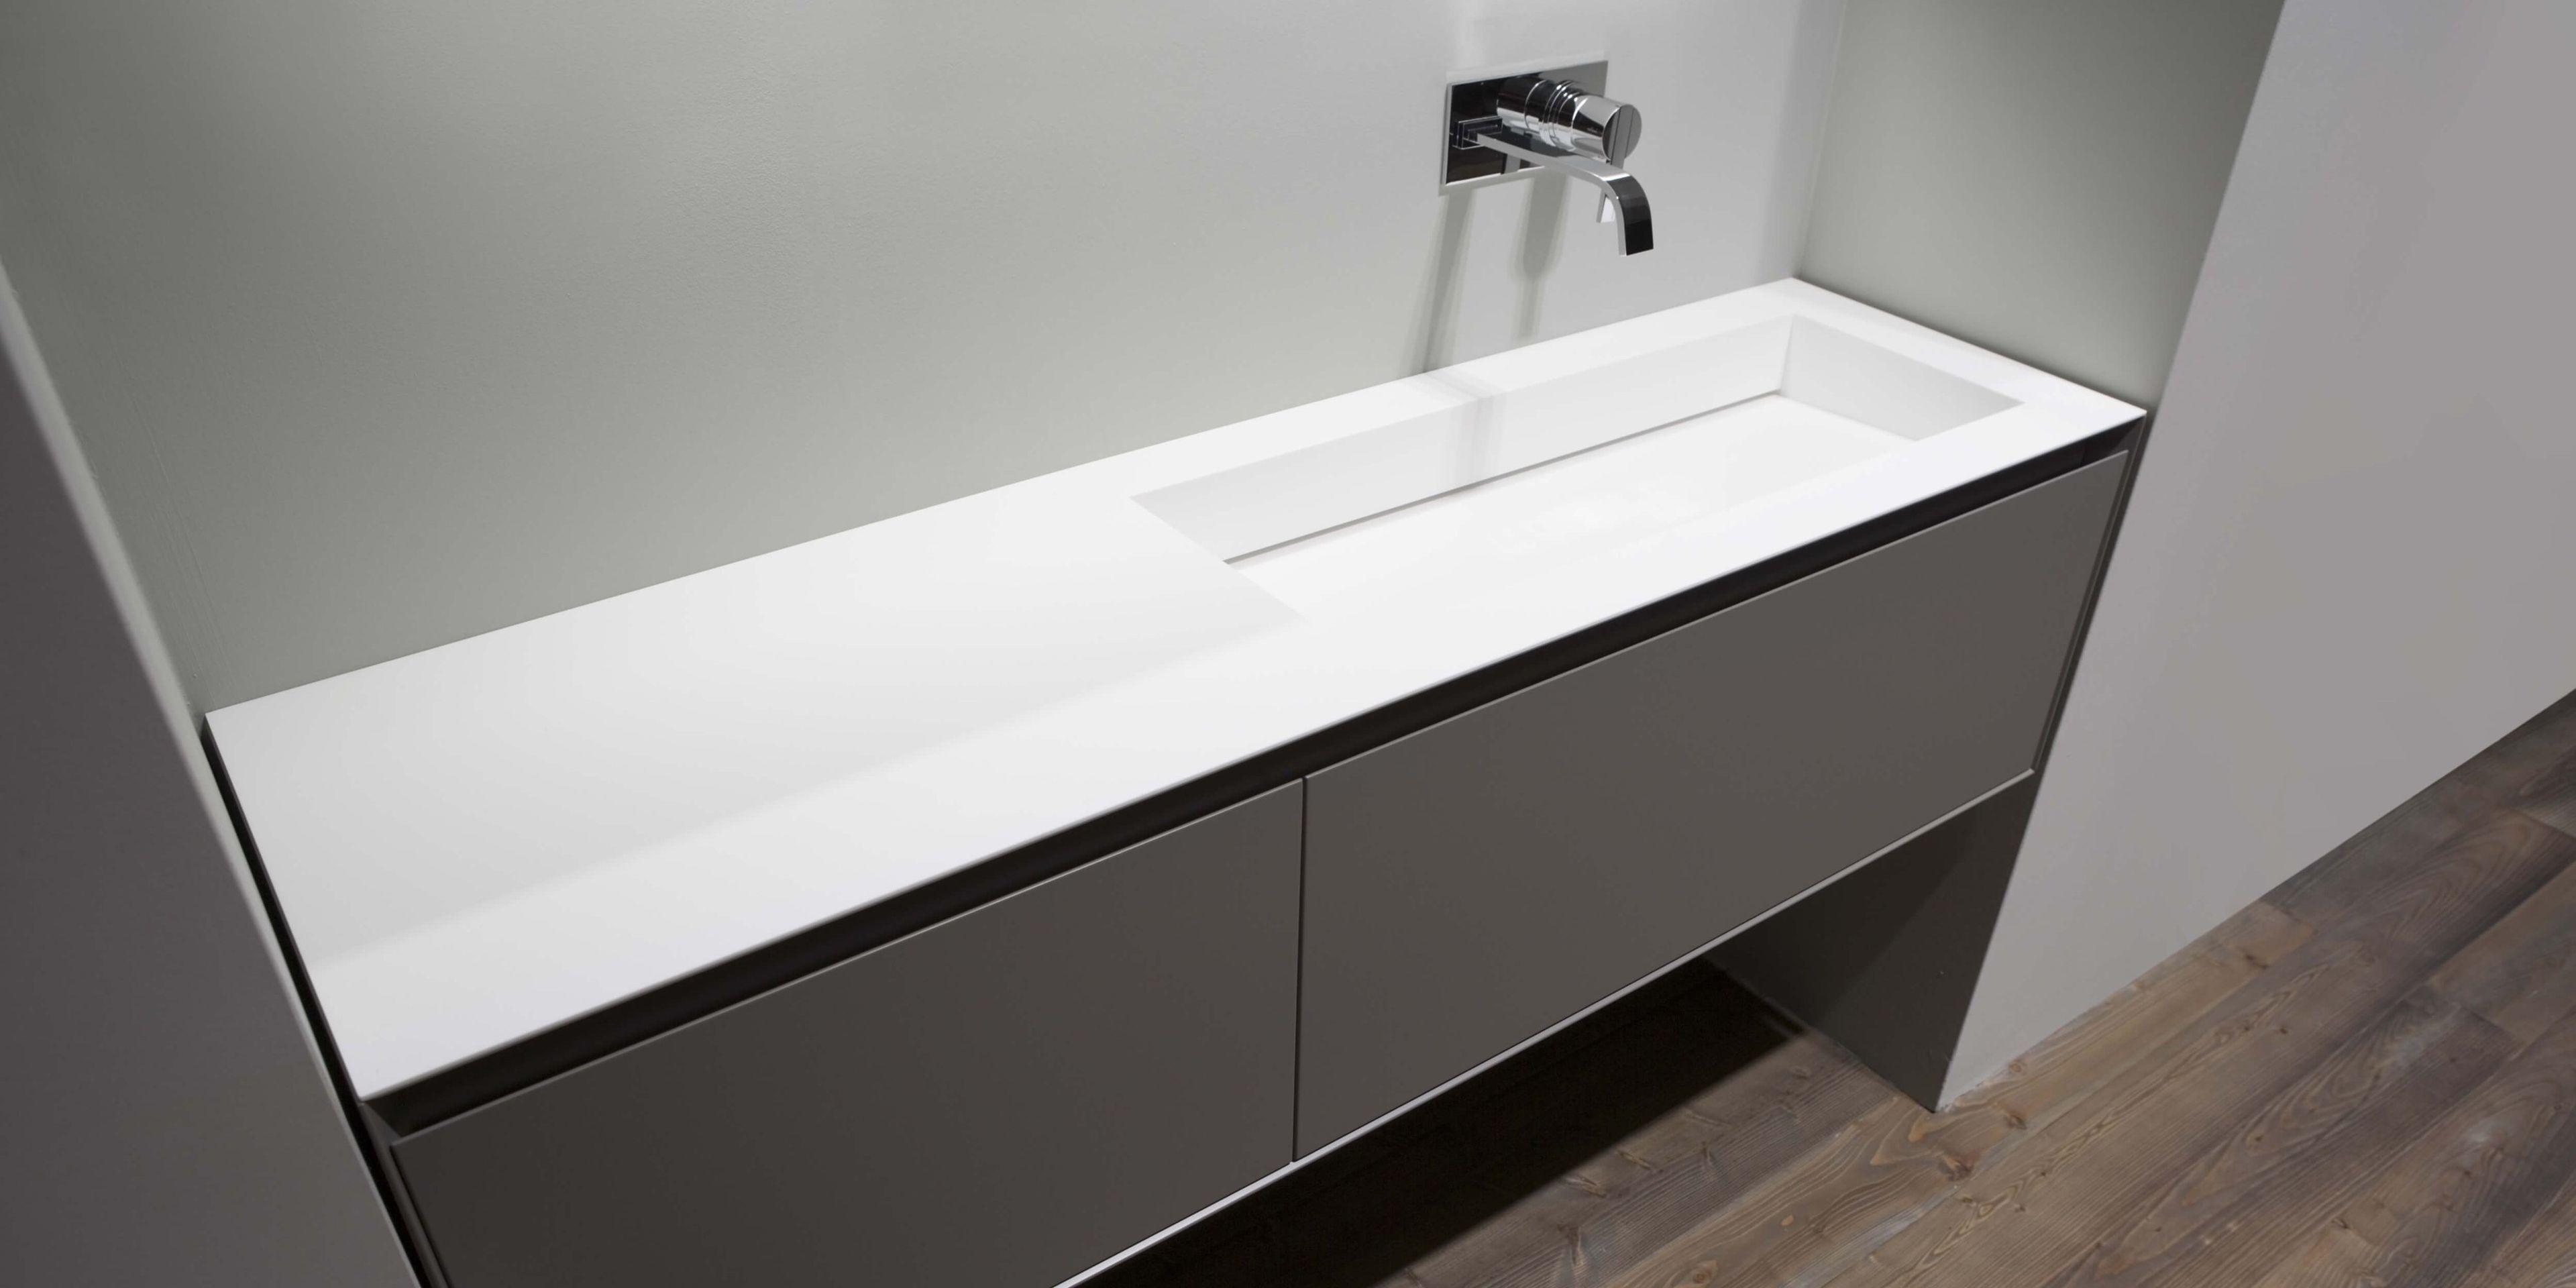 slot myslot by antonio lupi design. Black Bedroom Furniture Sets. Home Design Ideas